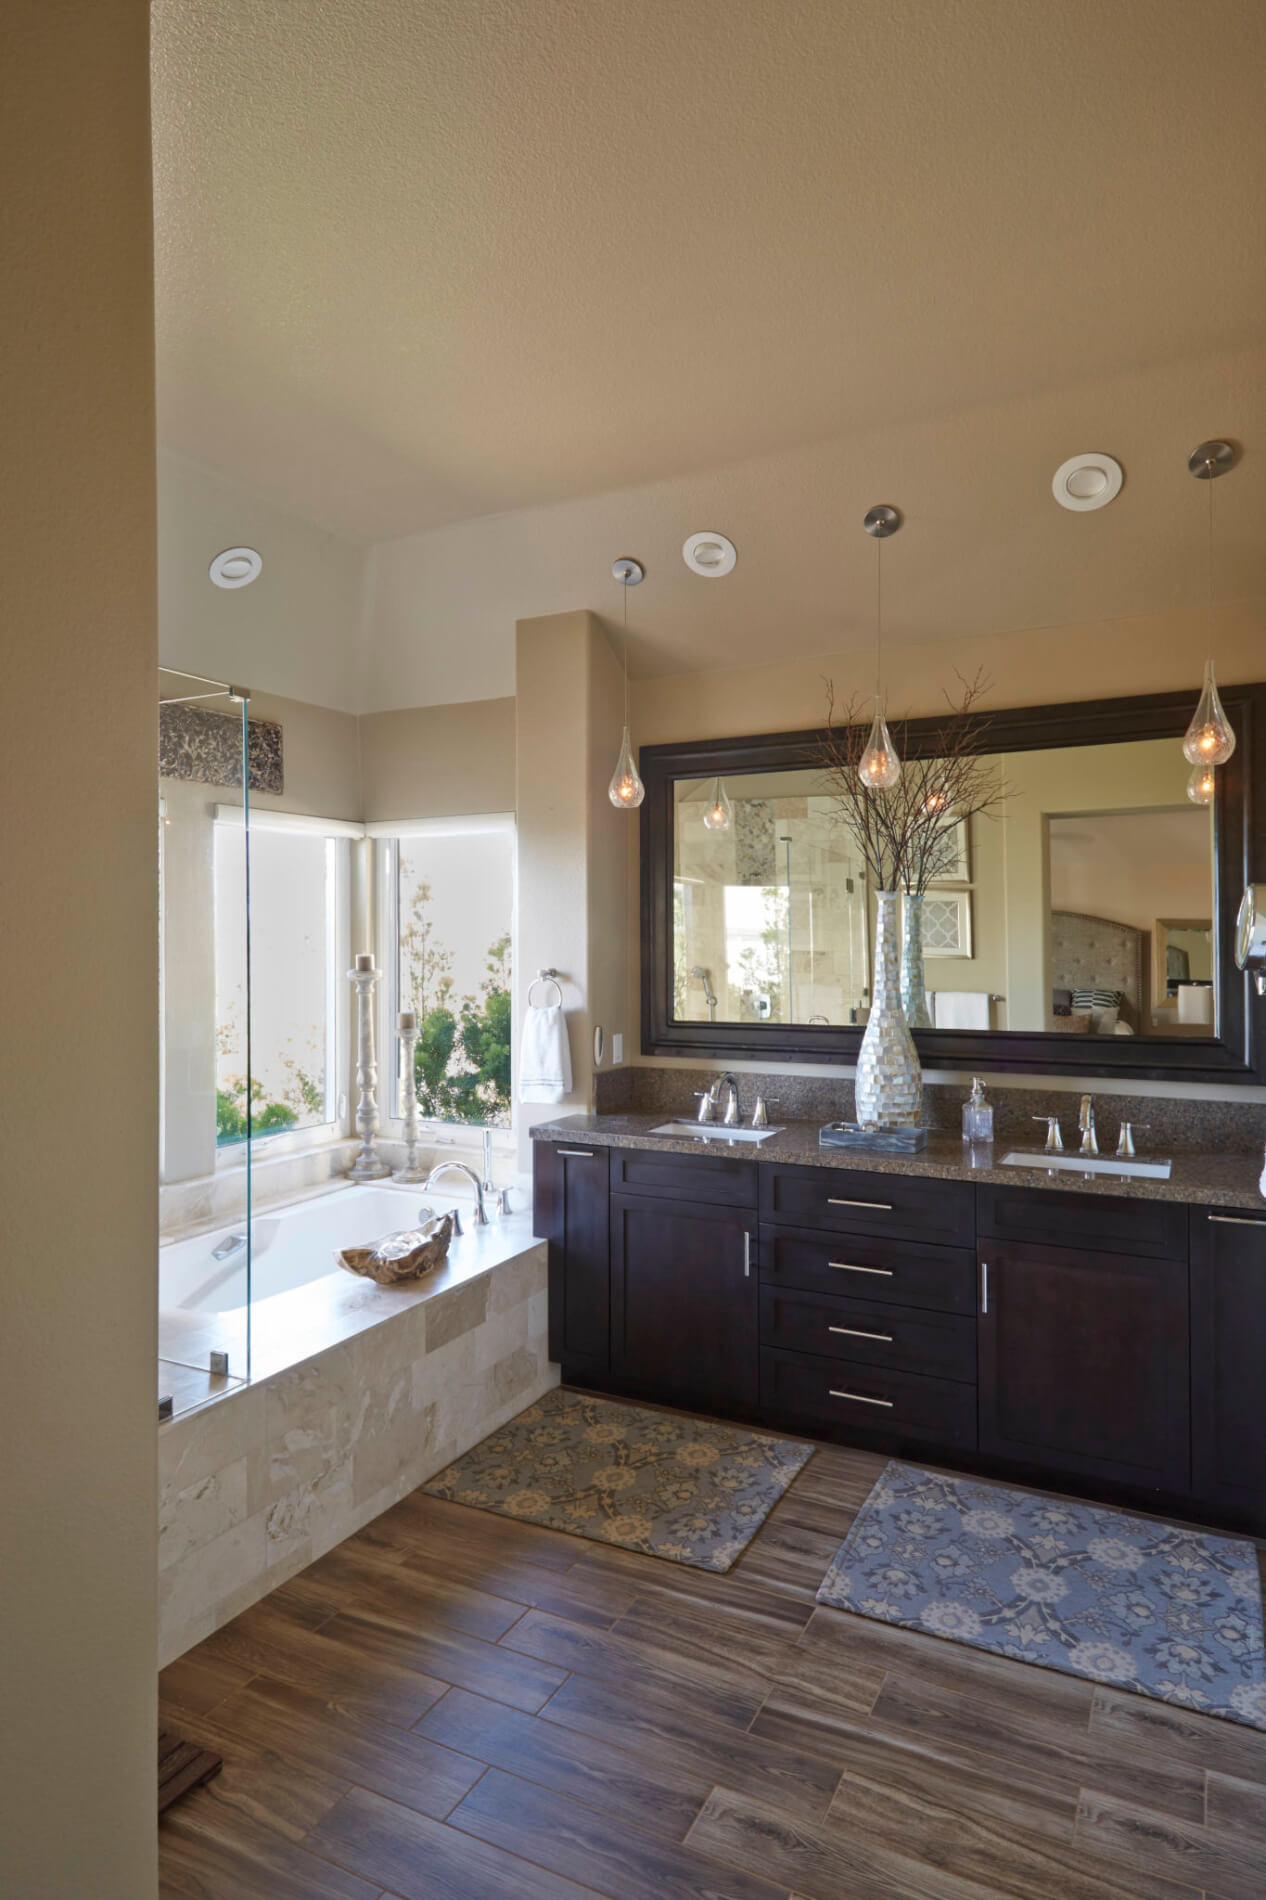 Large Bathroom Remodel Irvine, Large Bathroom Remodel Orange County, Large Bathroom Remodel Tustin